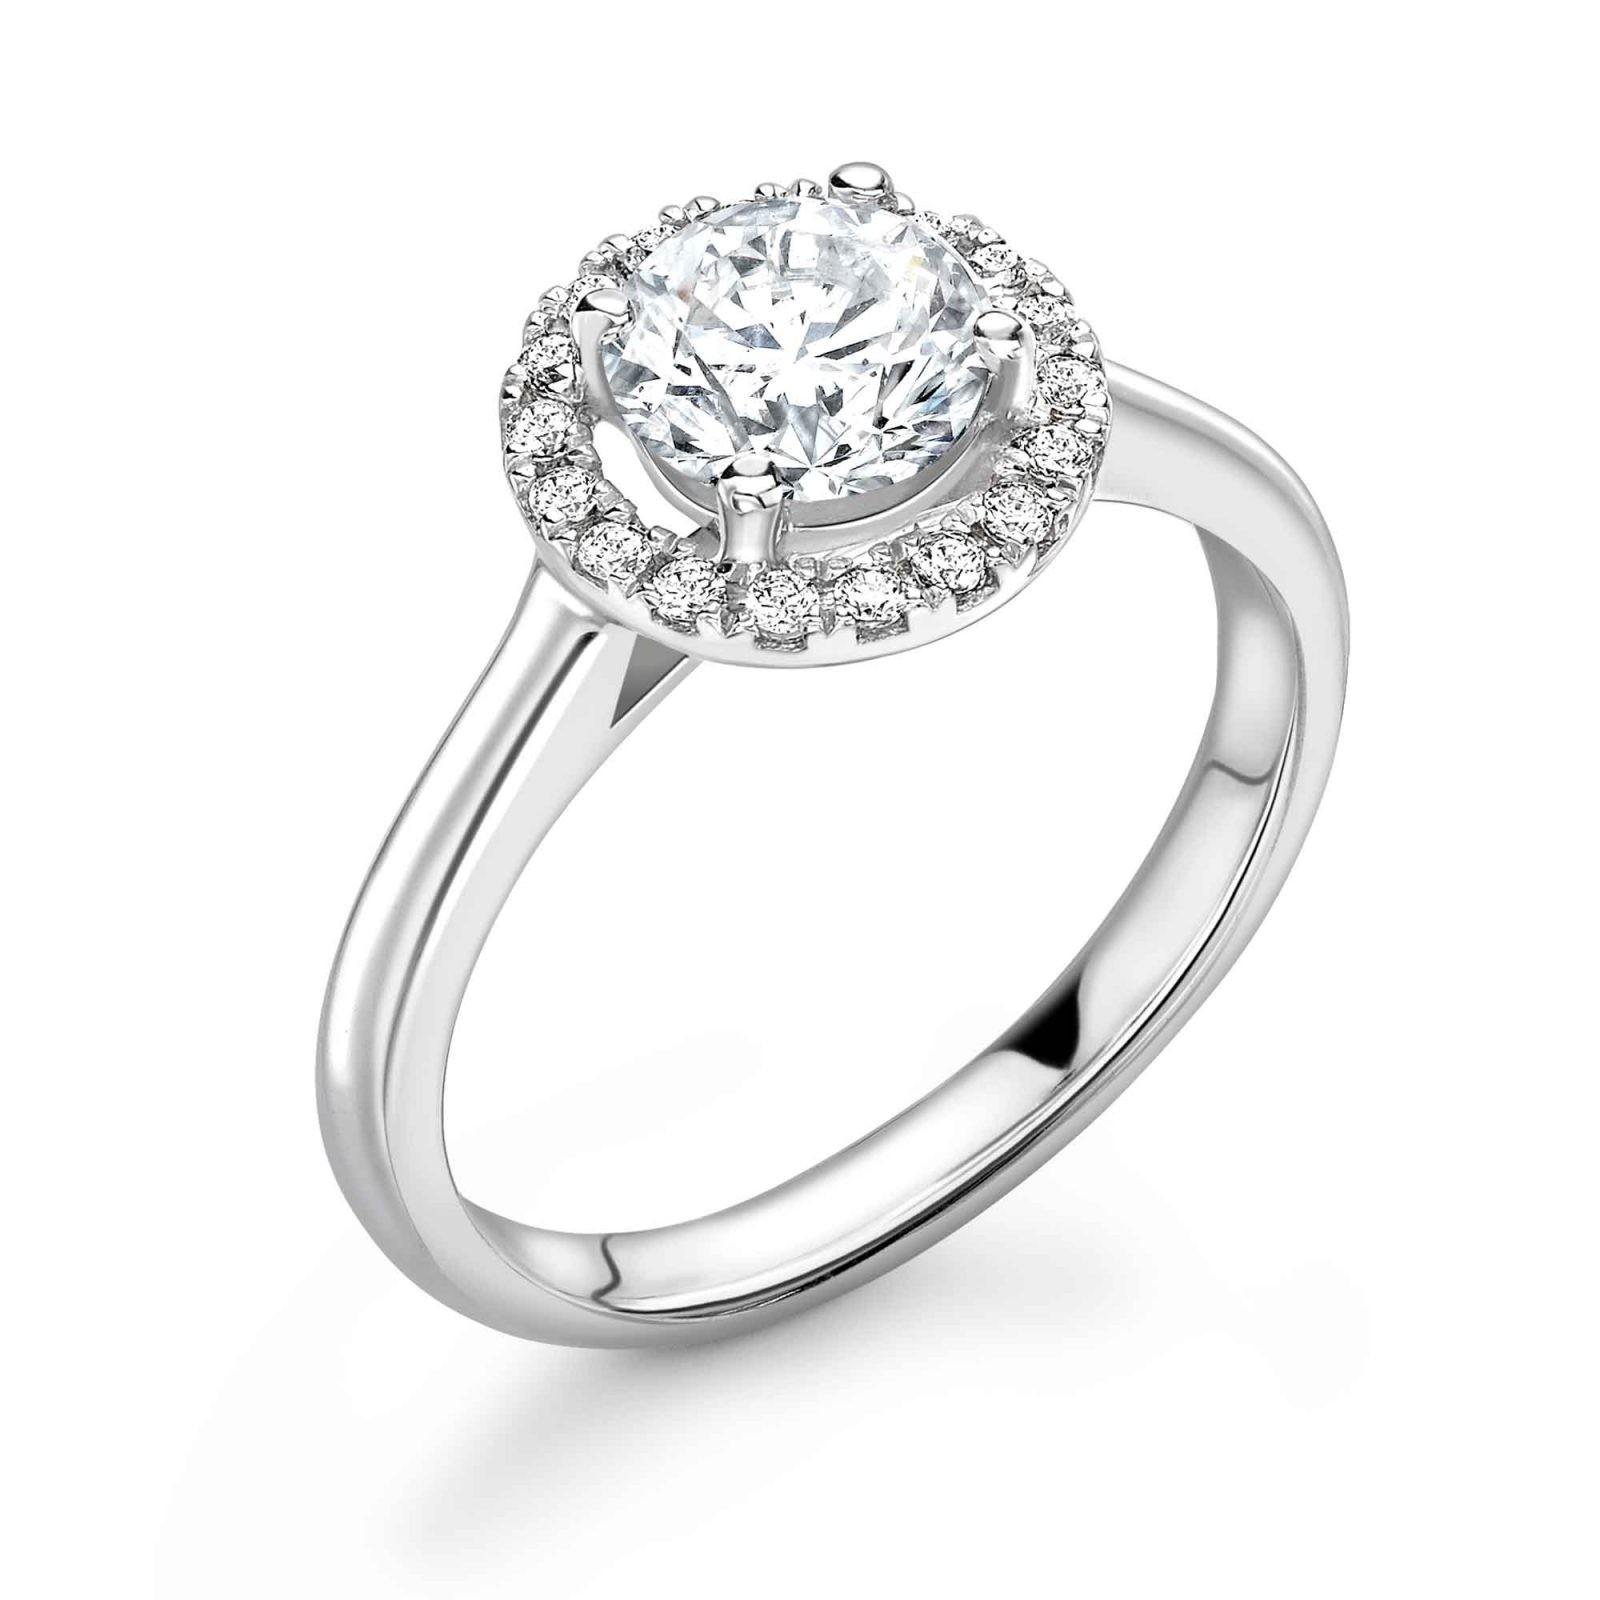 Diamond ring with diamond set halo castle setting